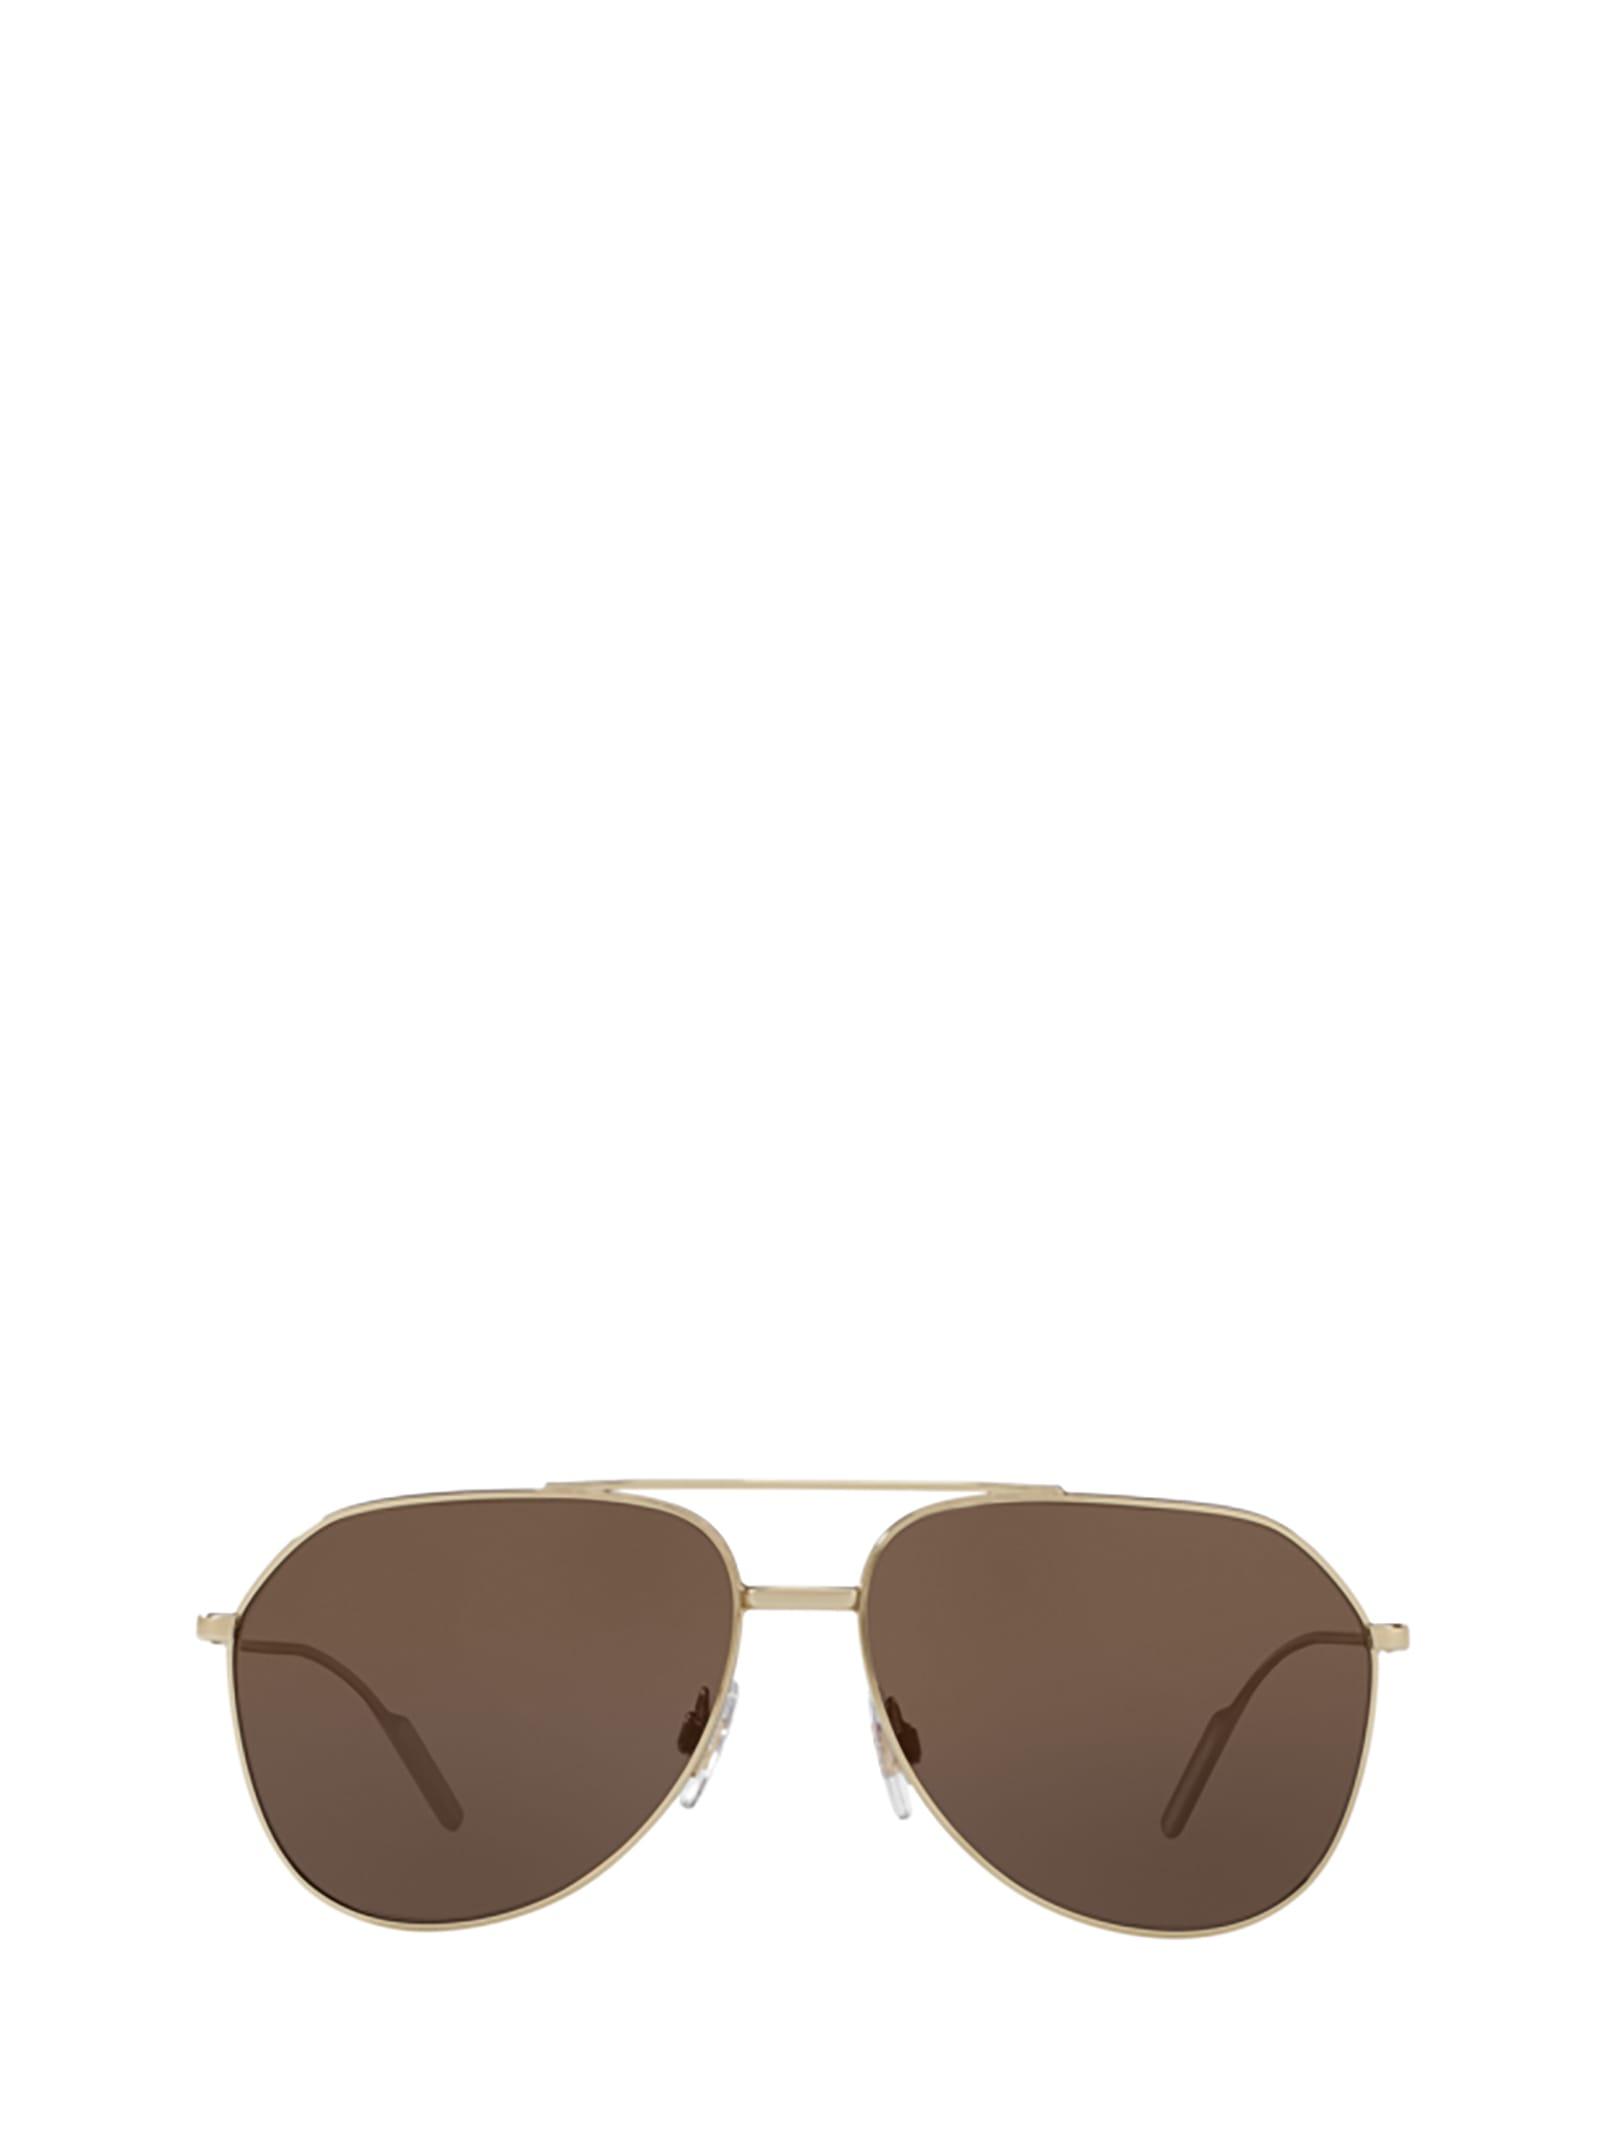 Dolce & Gabbana DG2166 488/73 SUNGLASSES